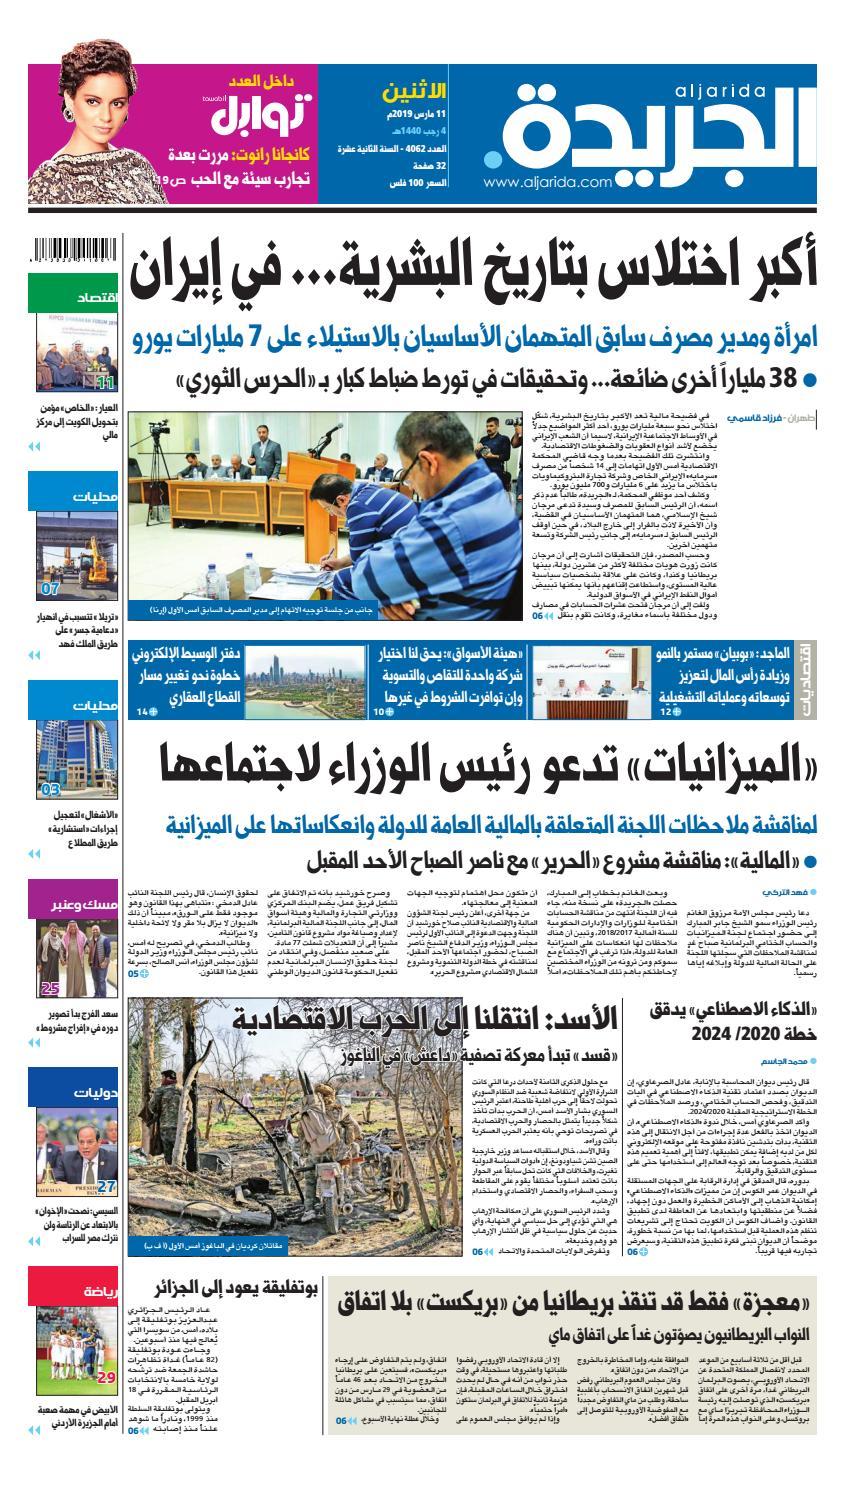 9d8808c16 عدد الجريدة الأثنين 11 مارس 2019 by Aljarida Newspaper - issuu